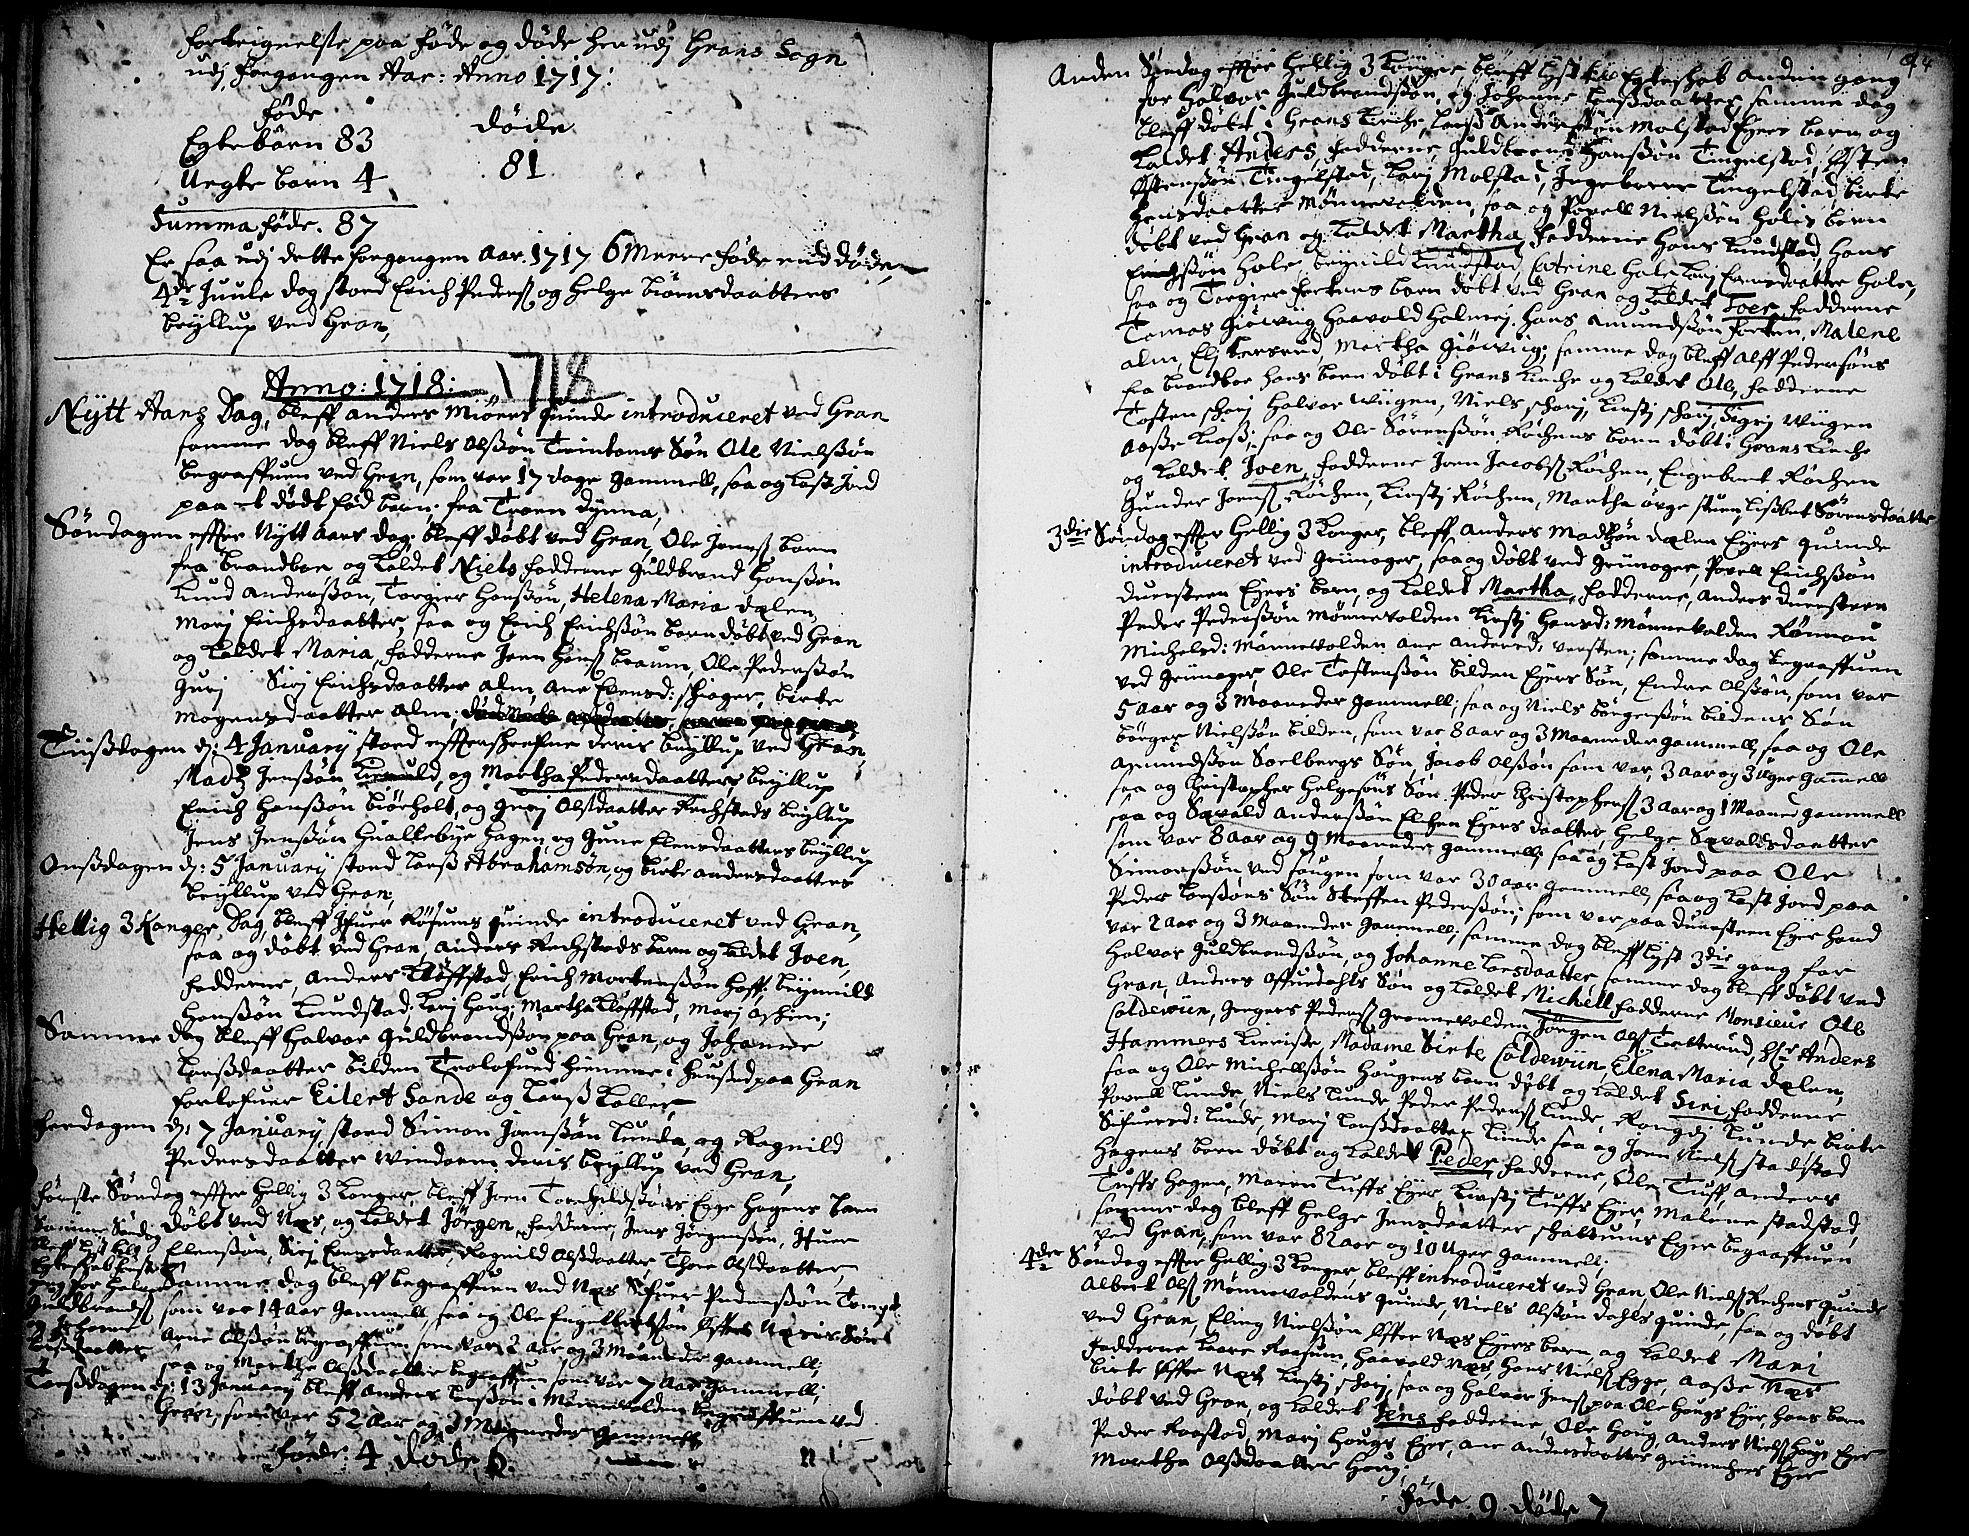 SAH, Gran prestekontor, Ministerialbok nr. 1, 1707-1731, s. 94